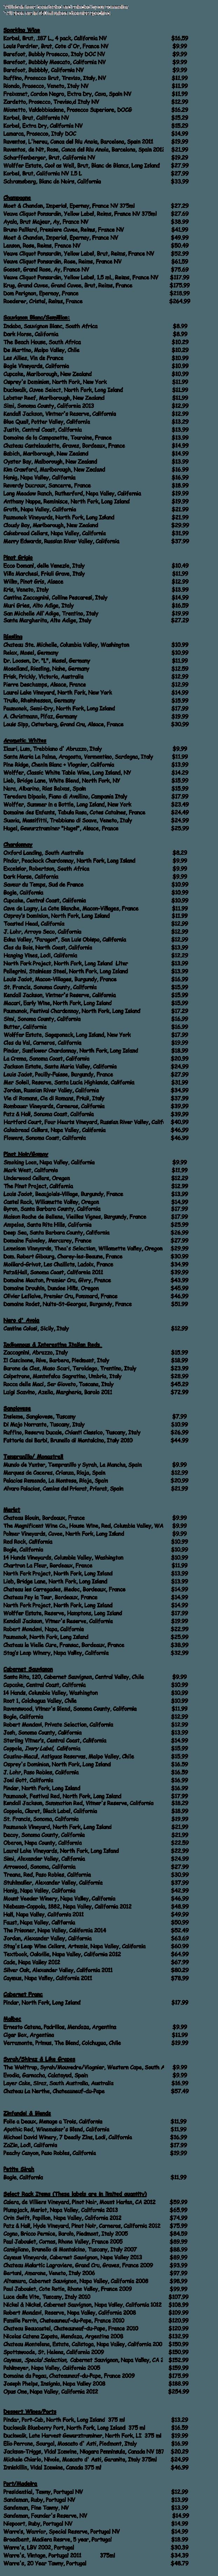 Liquor store   Manorville, NY   Towne Cellars Wines & Liquors   631-874-0451